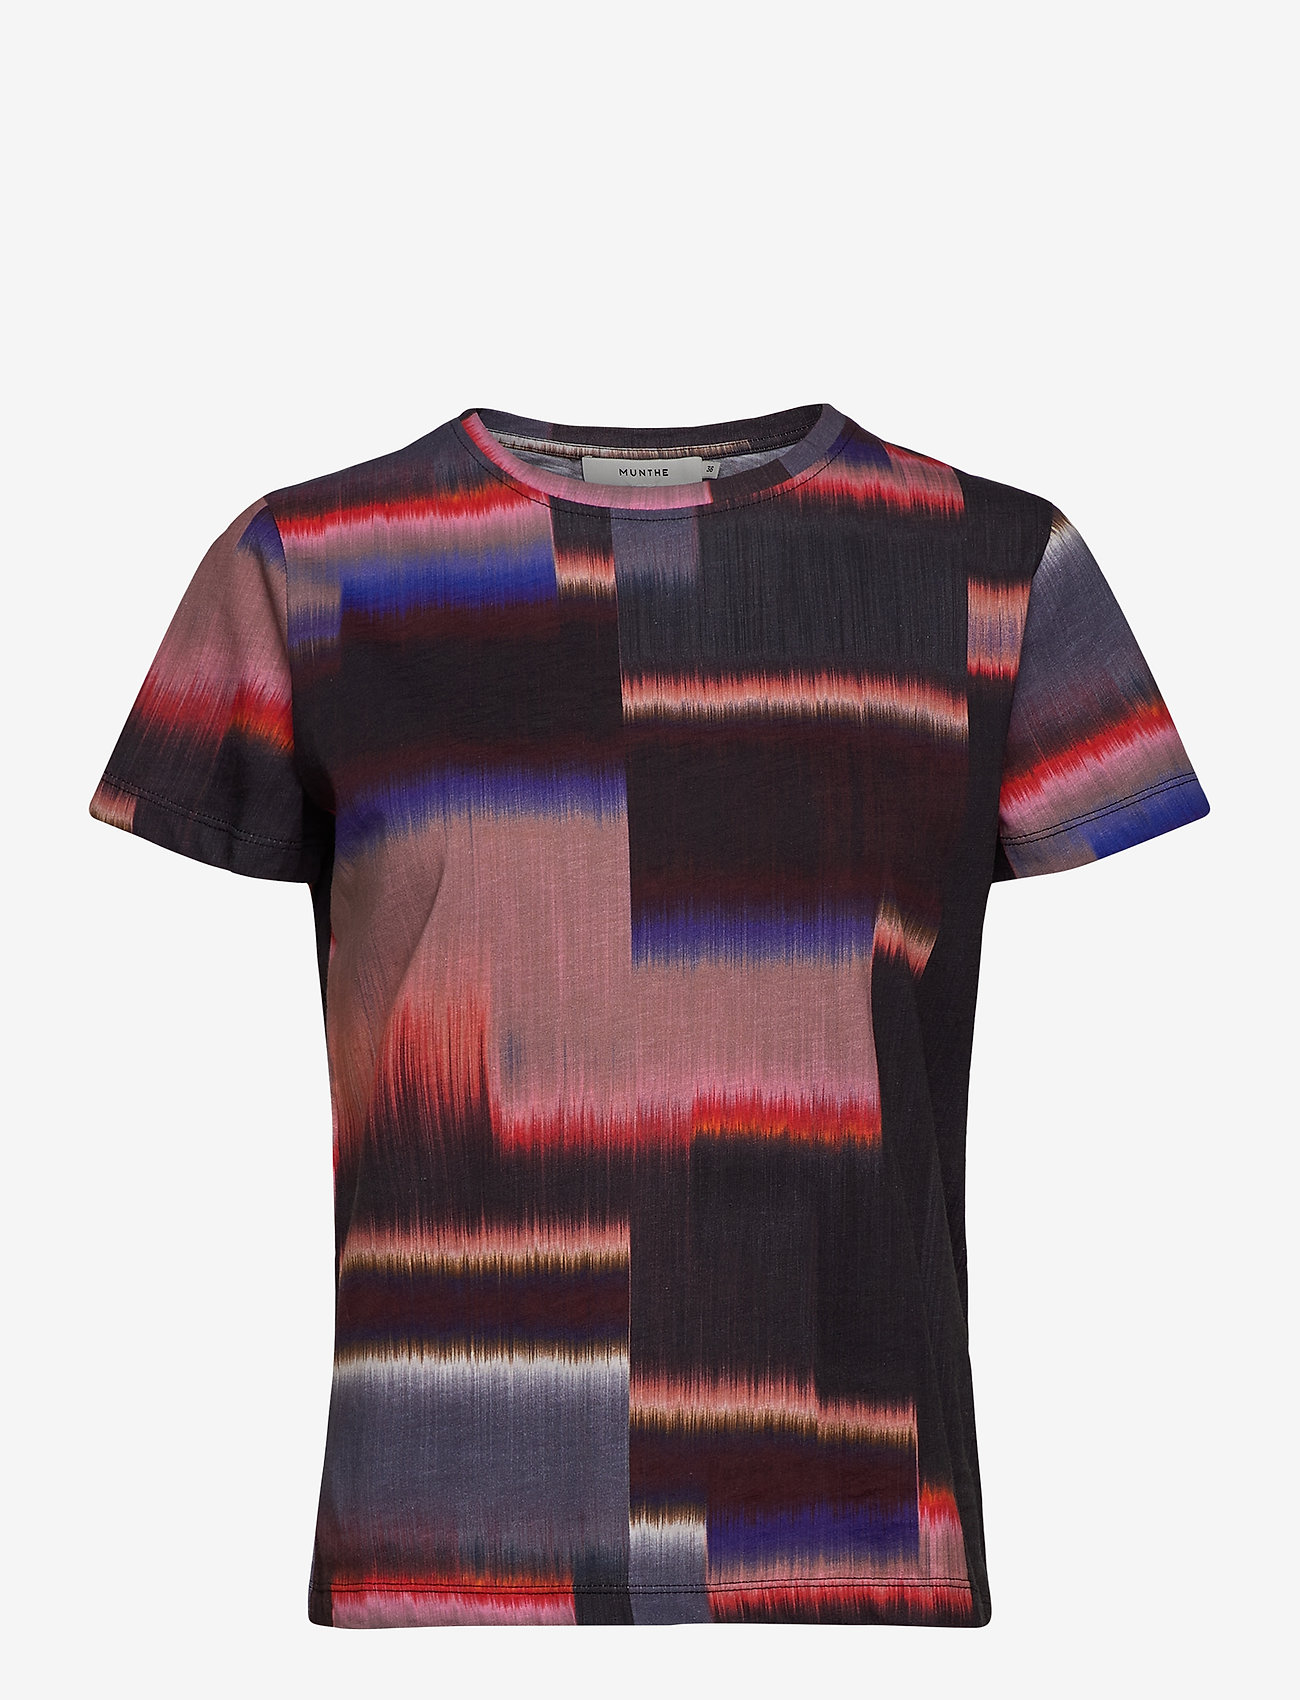 Munthe - LADY - t-shirts - red - 1